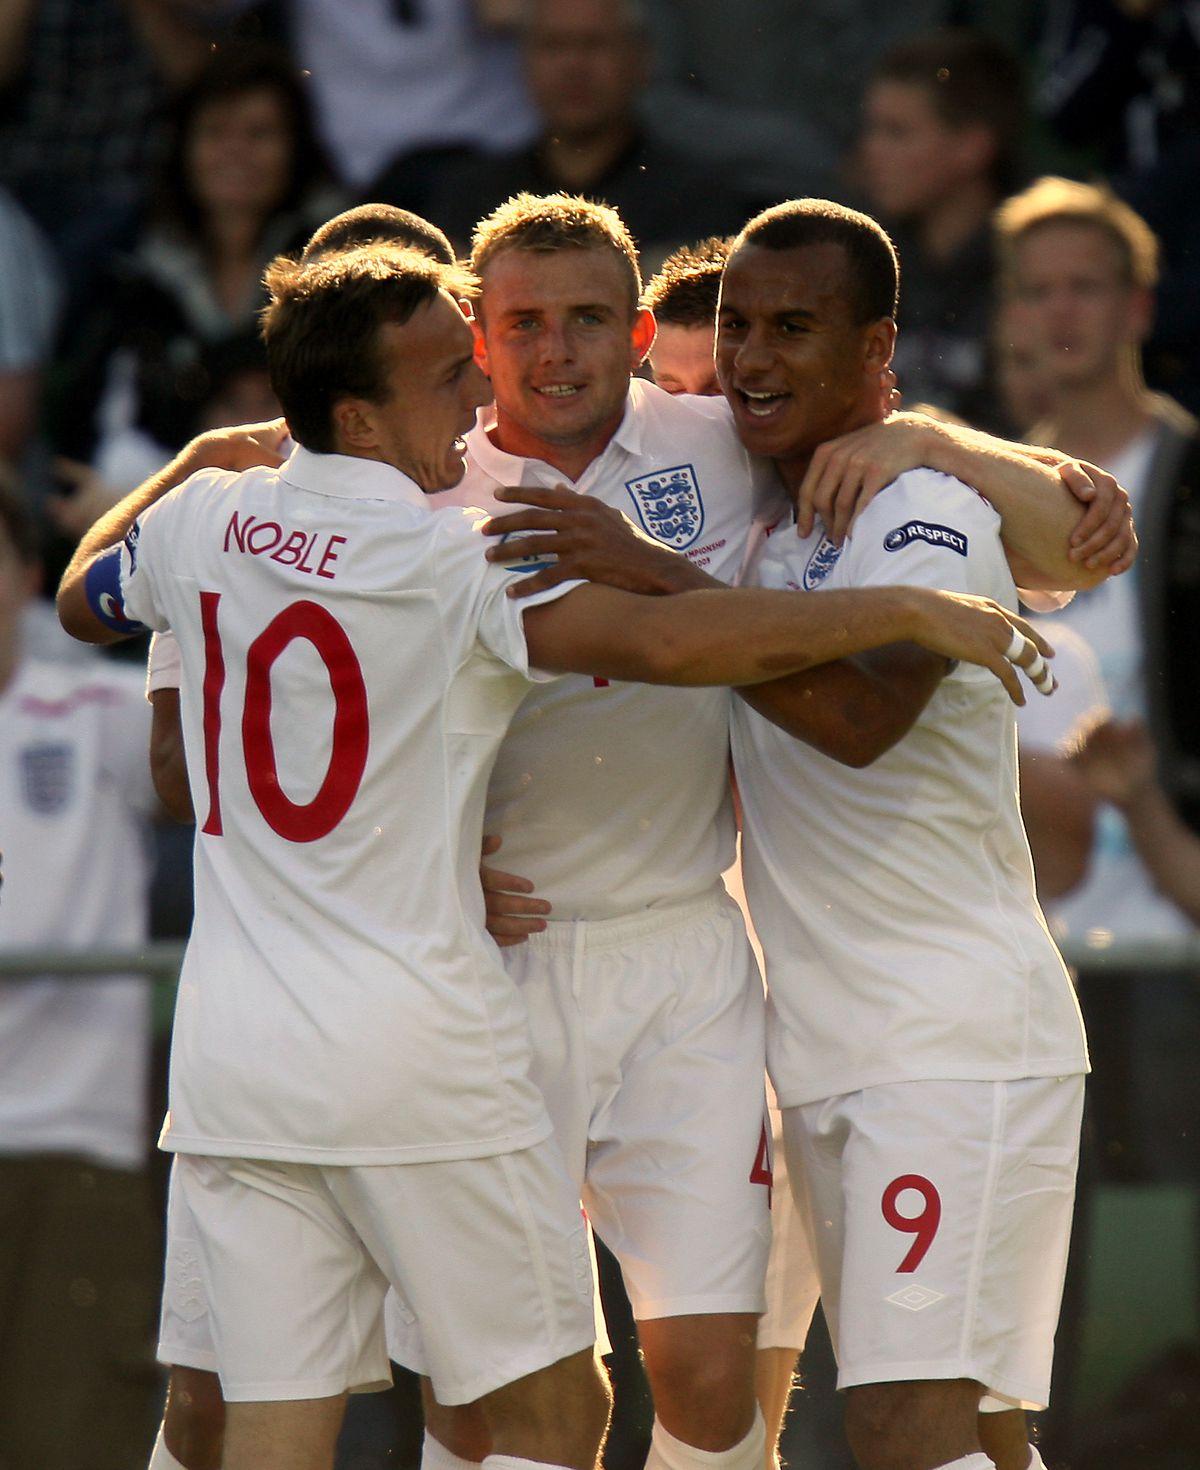 Soccer - UEFA Under 21 European Championship - Group B - England v Finland - Orjans vall